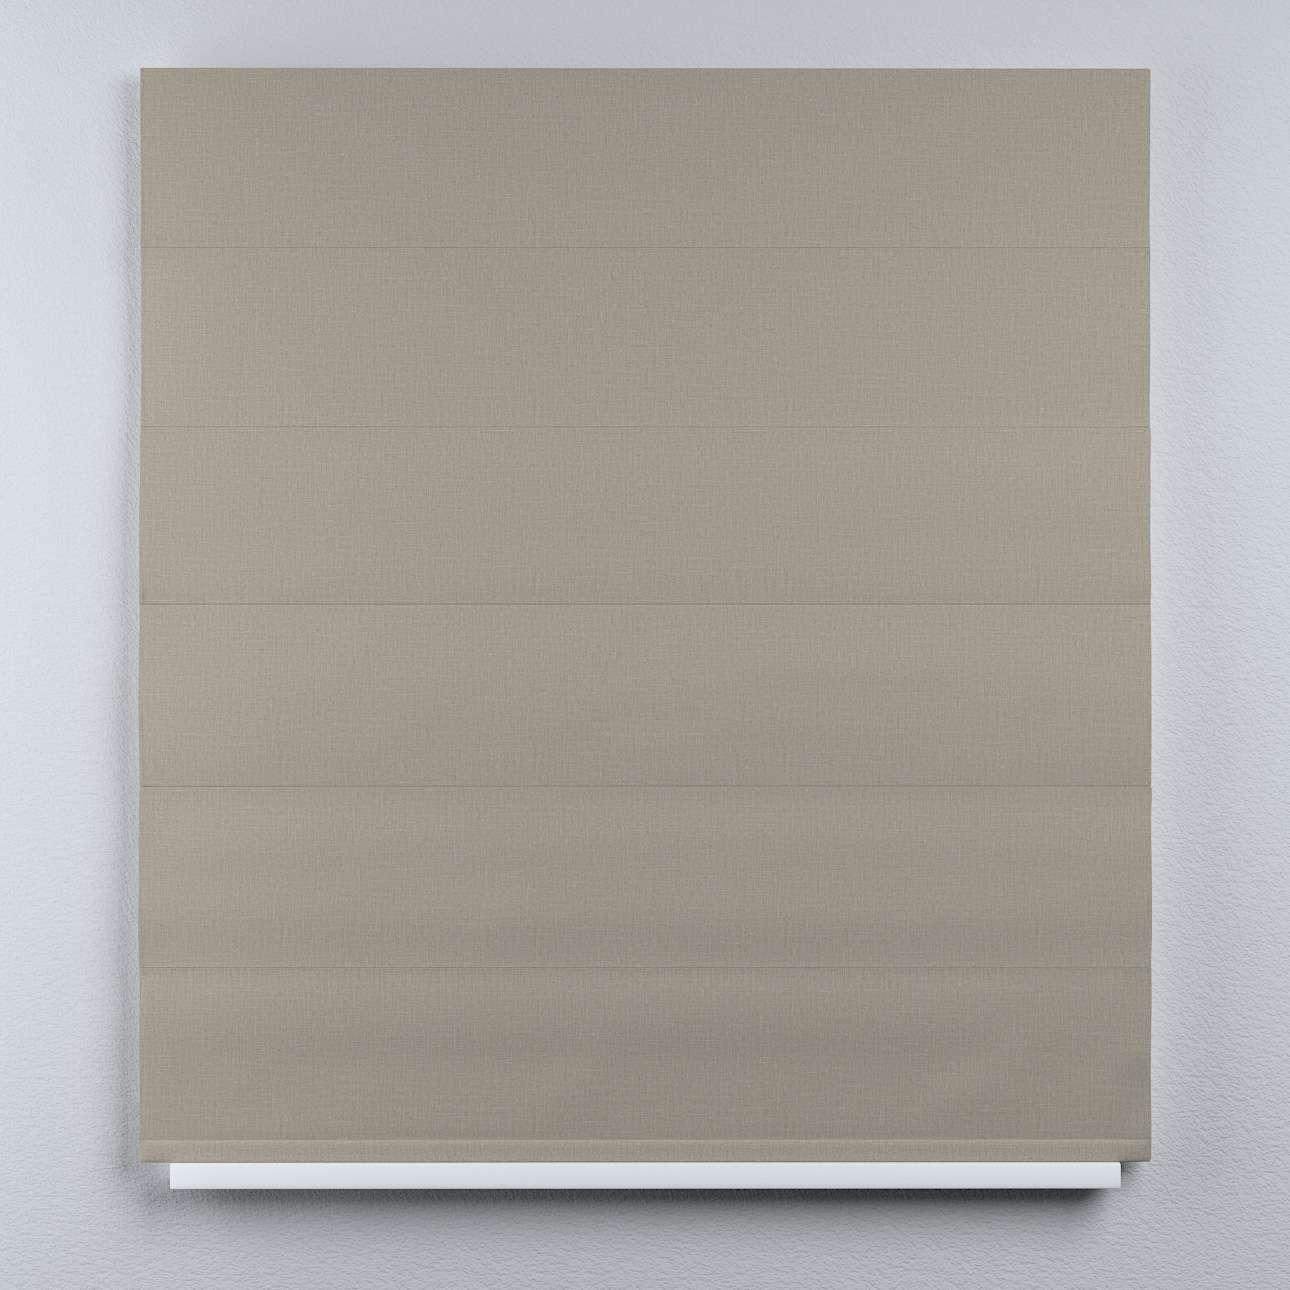 DUO Rímska roleta V kolekcii Blackout 280 cm, tkanina: 269-11